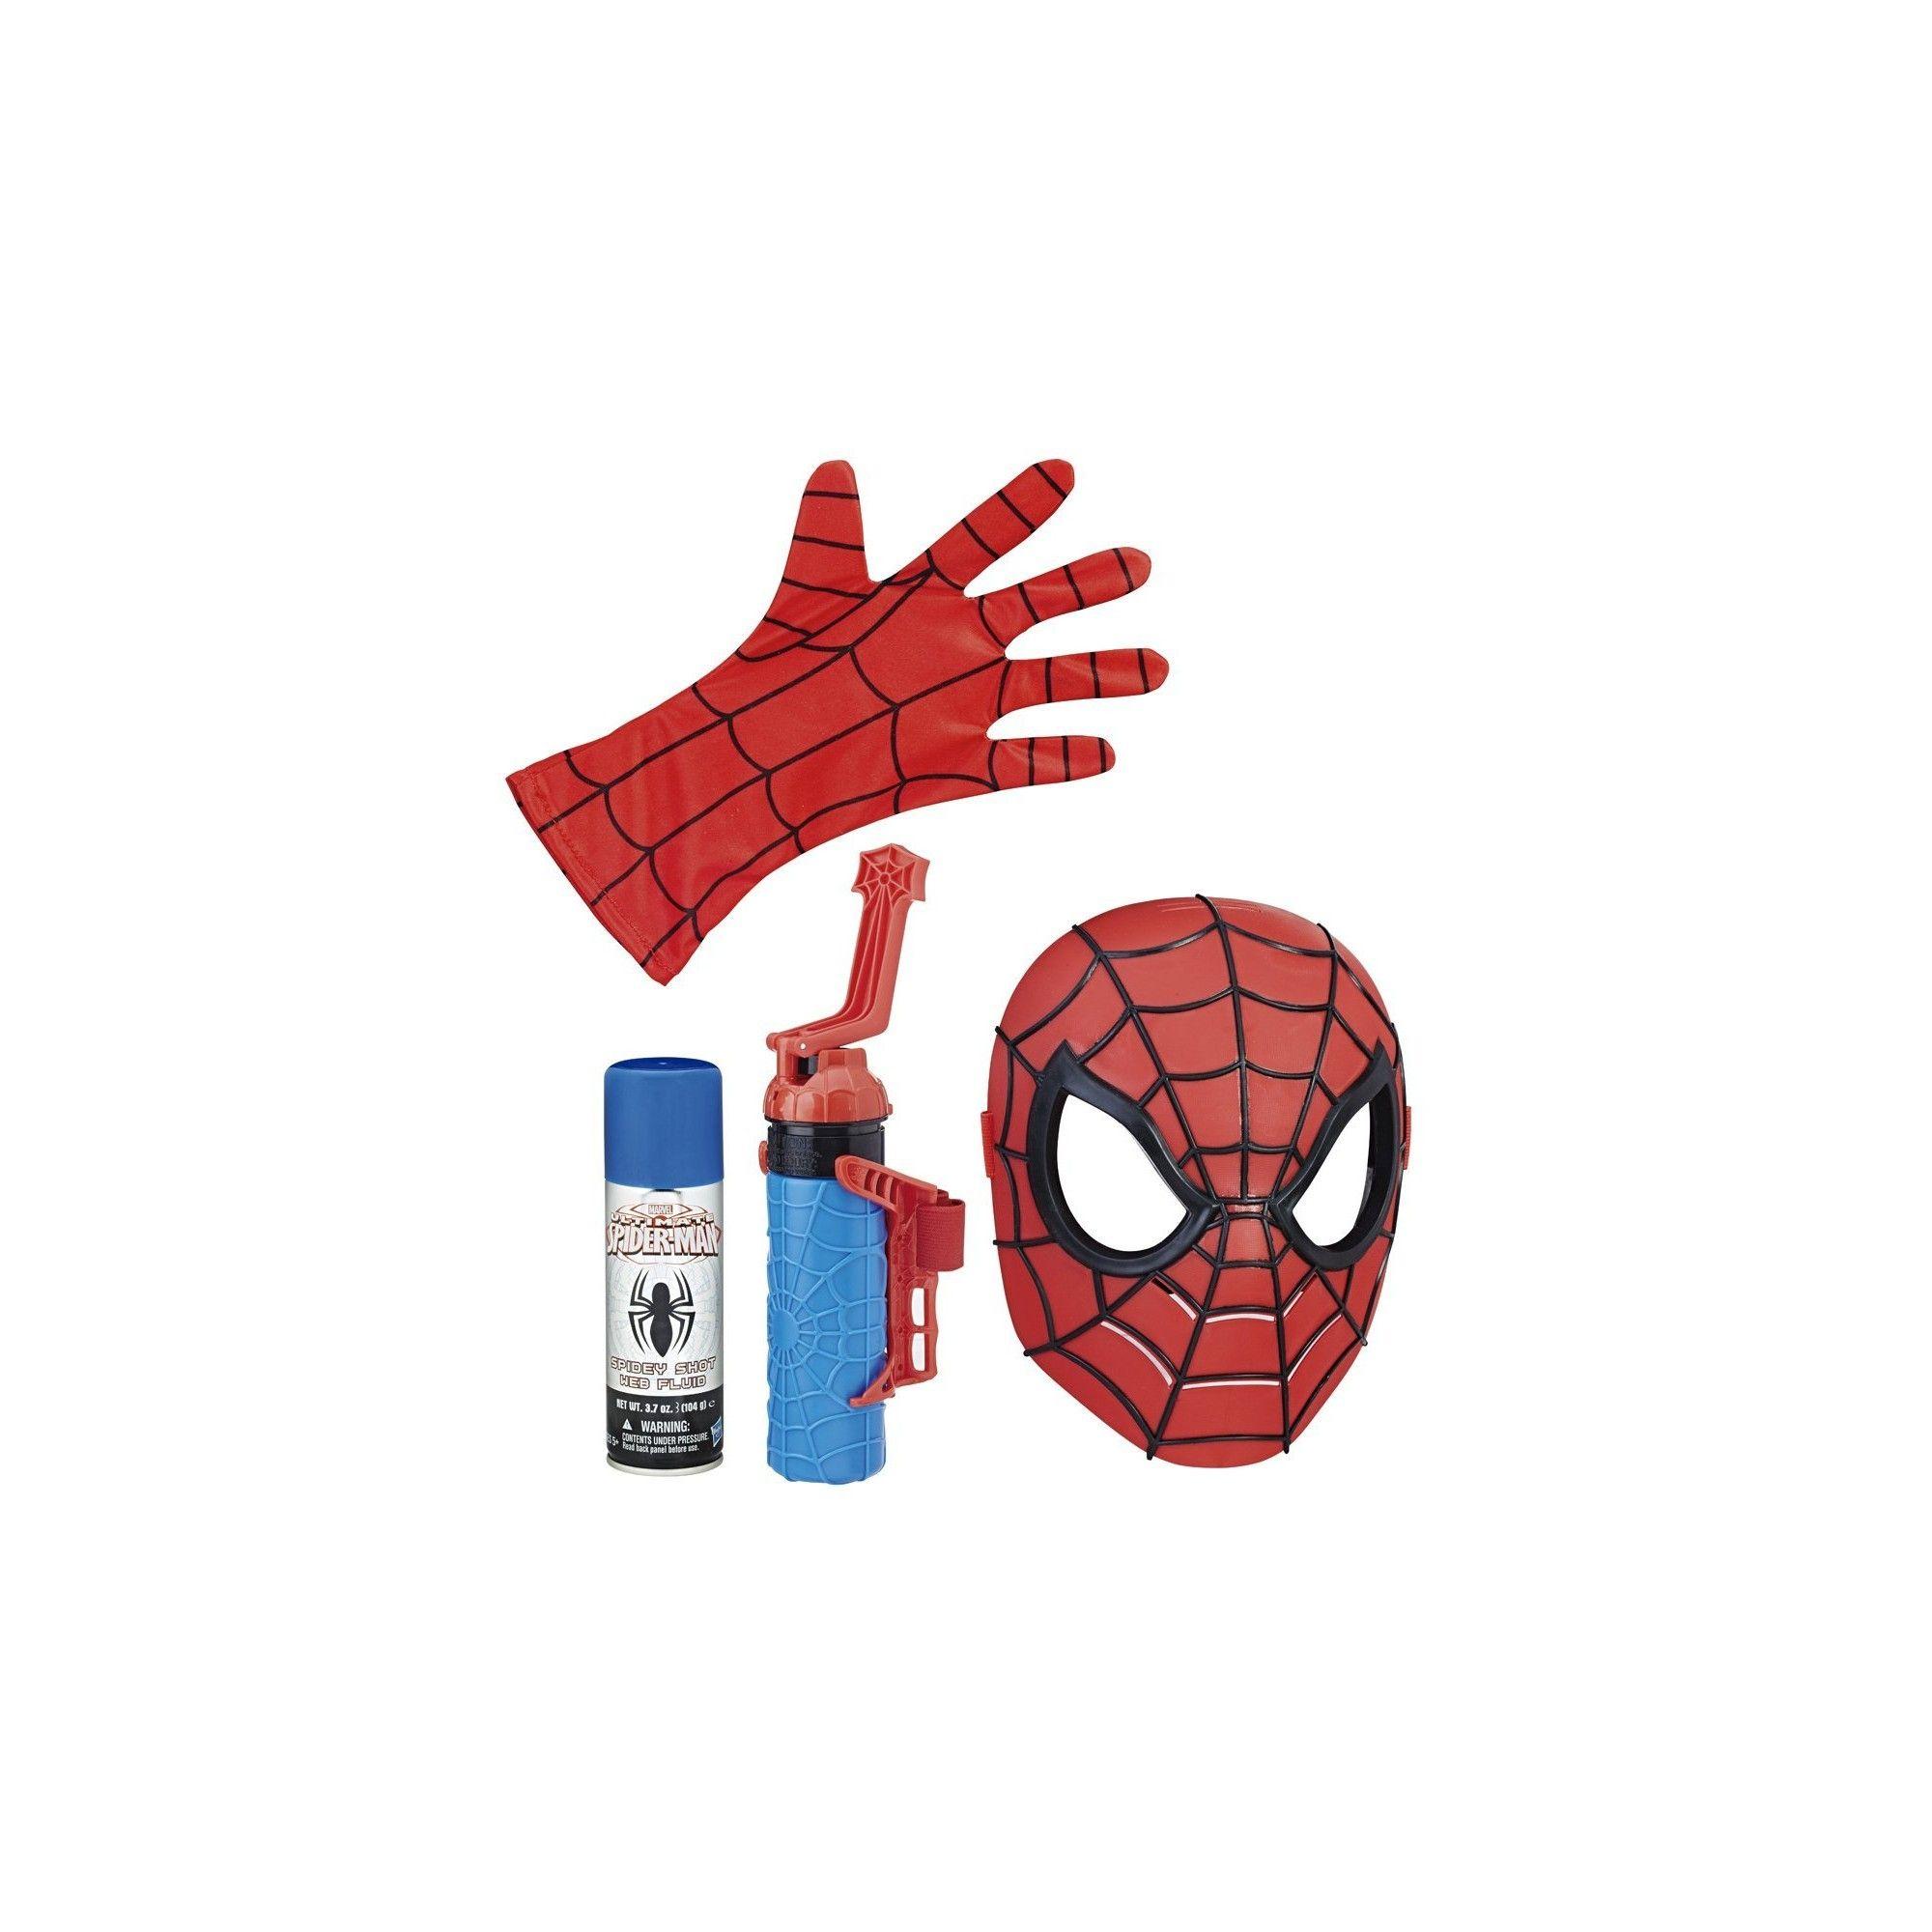 Spider man masque et dispositif lanceur de toiles c3308 - Et spider man ...